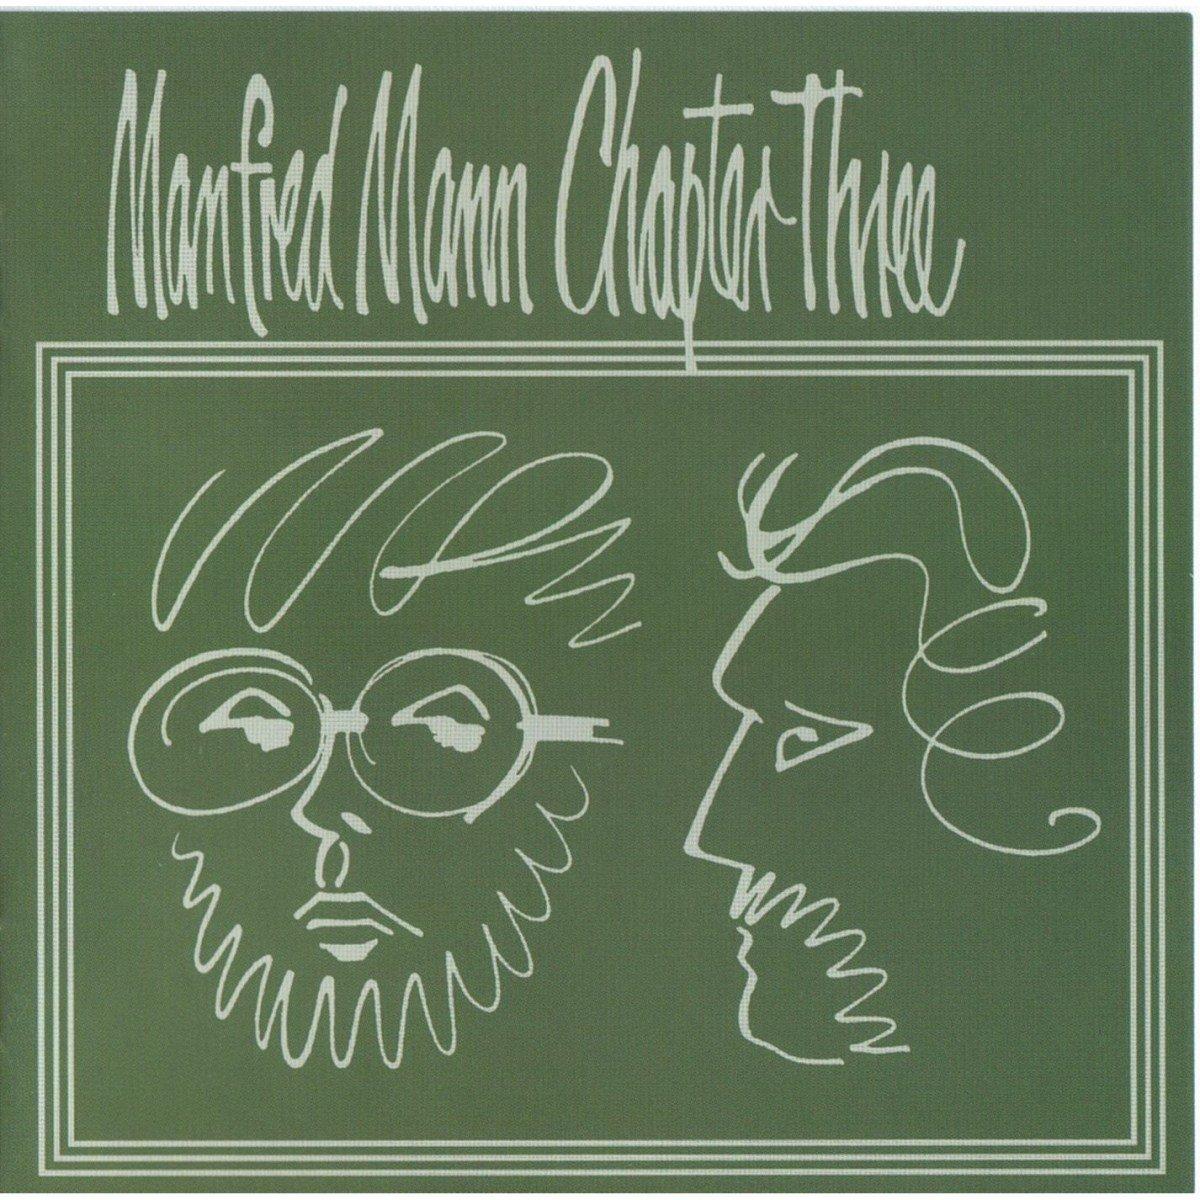 Vinilo : Manfred Mann's Earth Band - Manfred Mann Chapter Three (United Kingdom - Import)